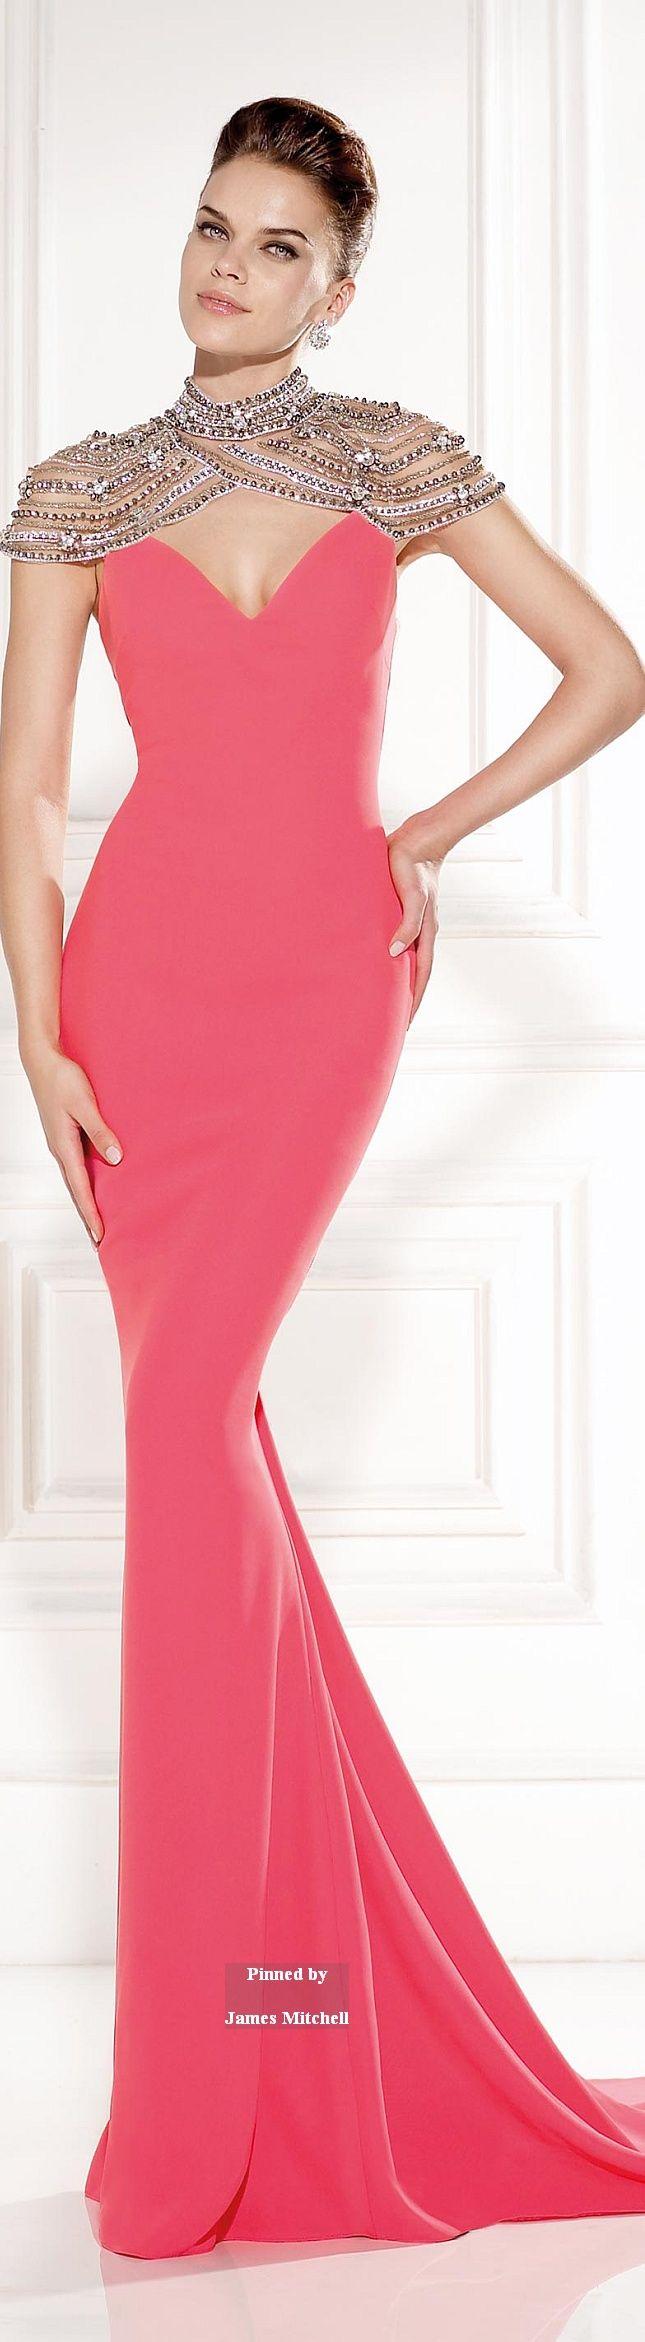 27 best Tarik ediz images on Pinterest   Evening dresses, Evening ...